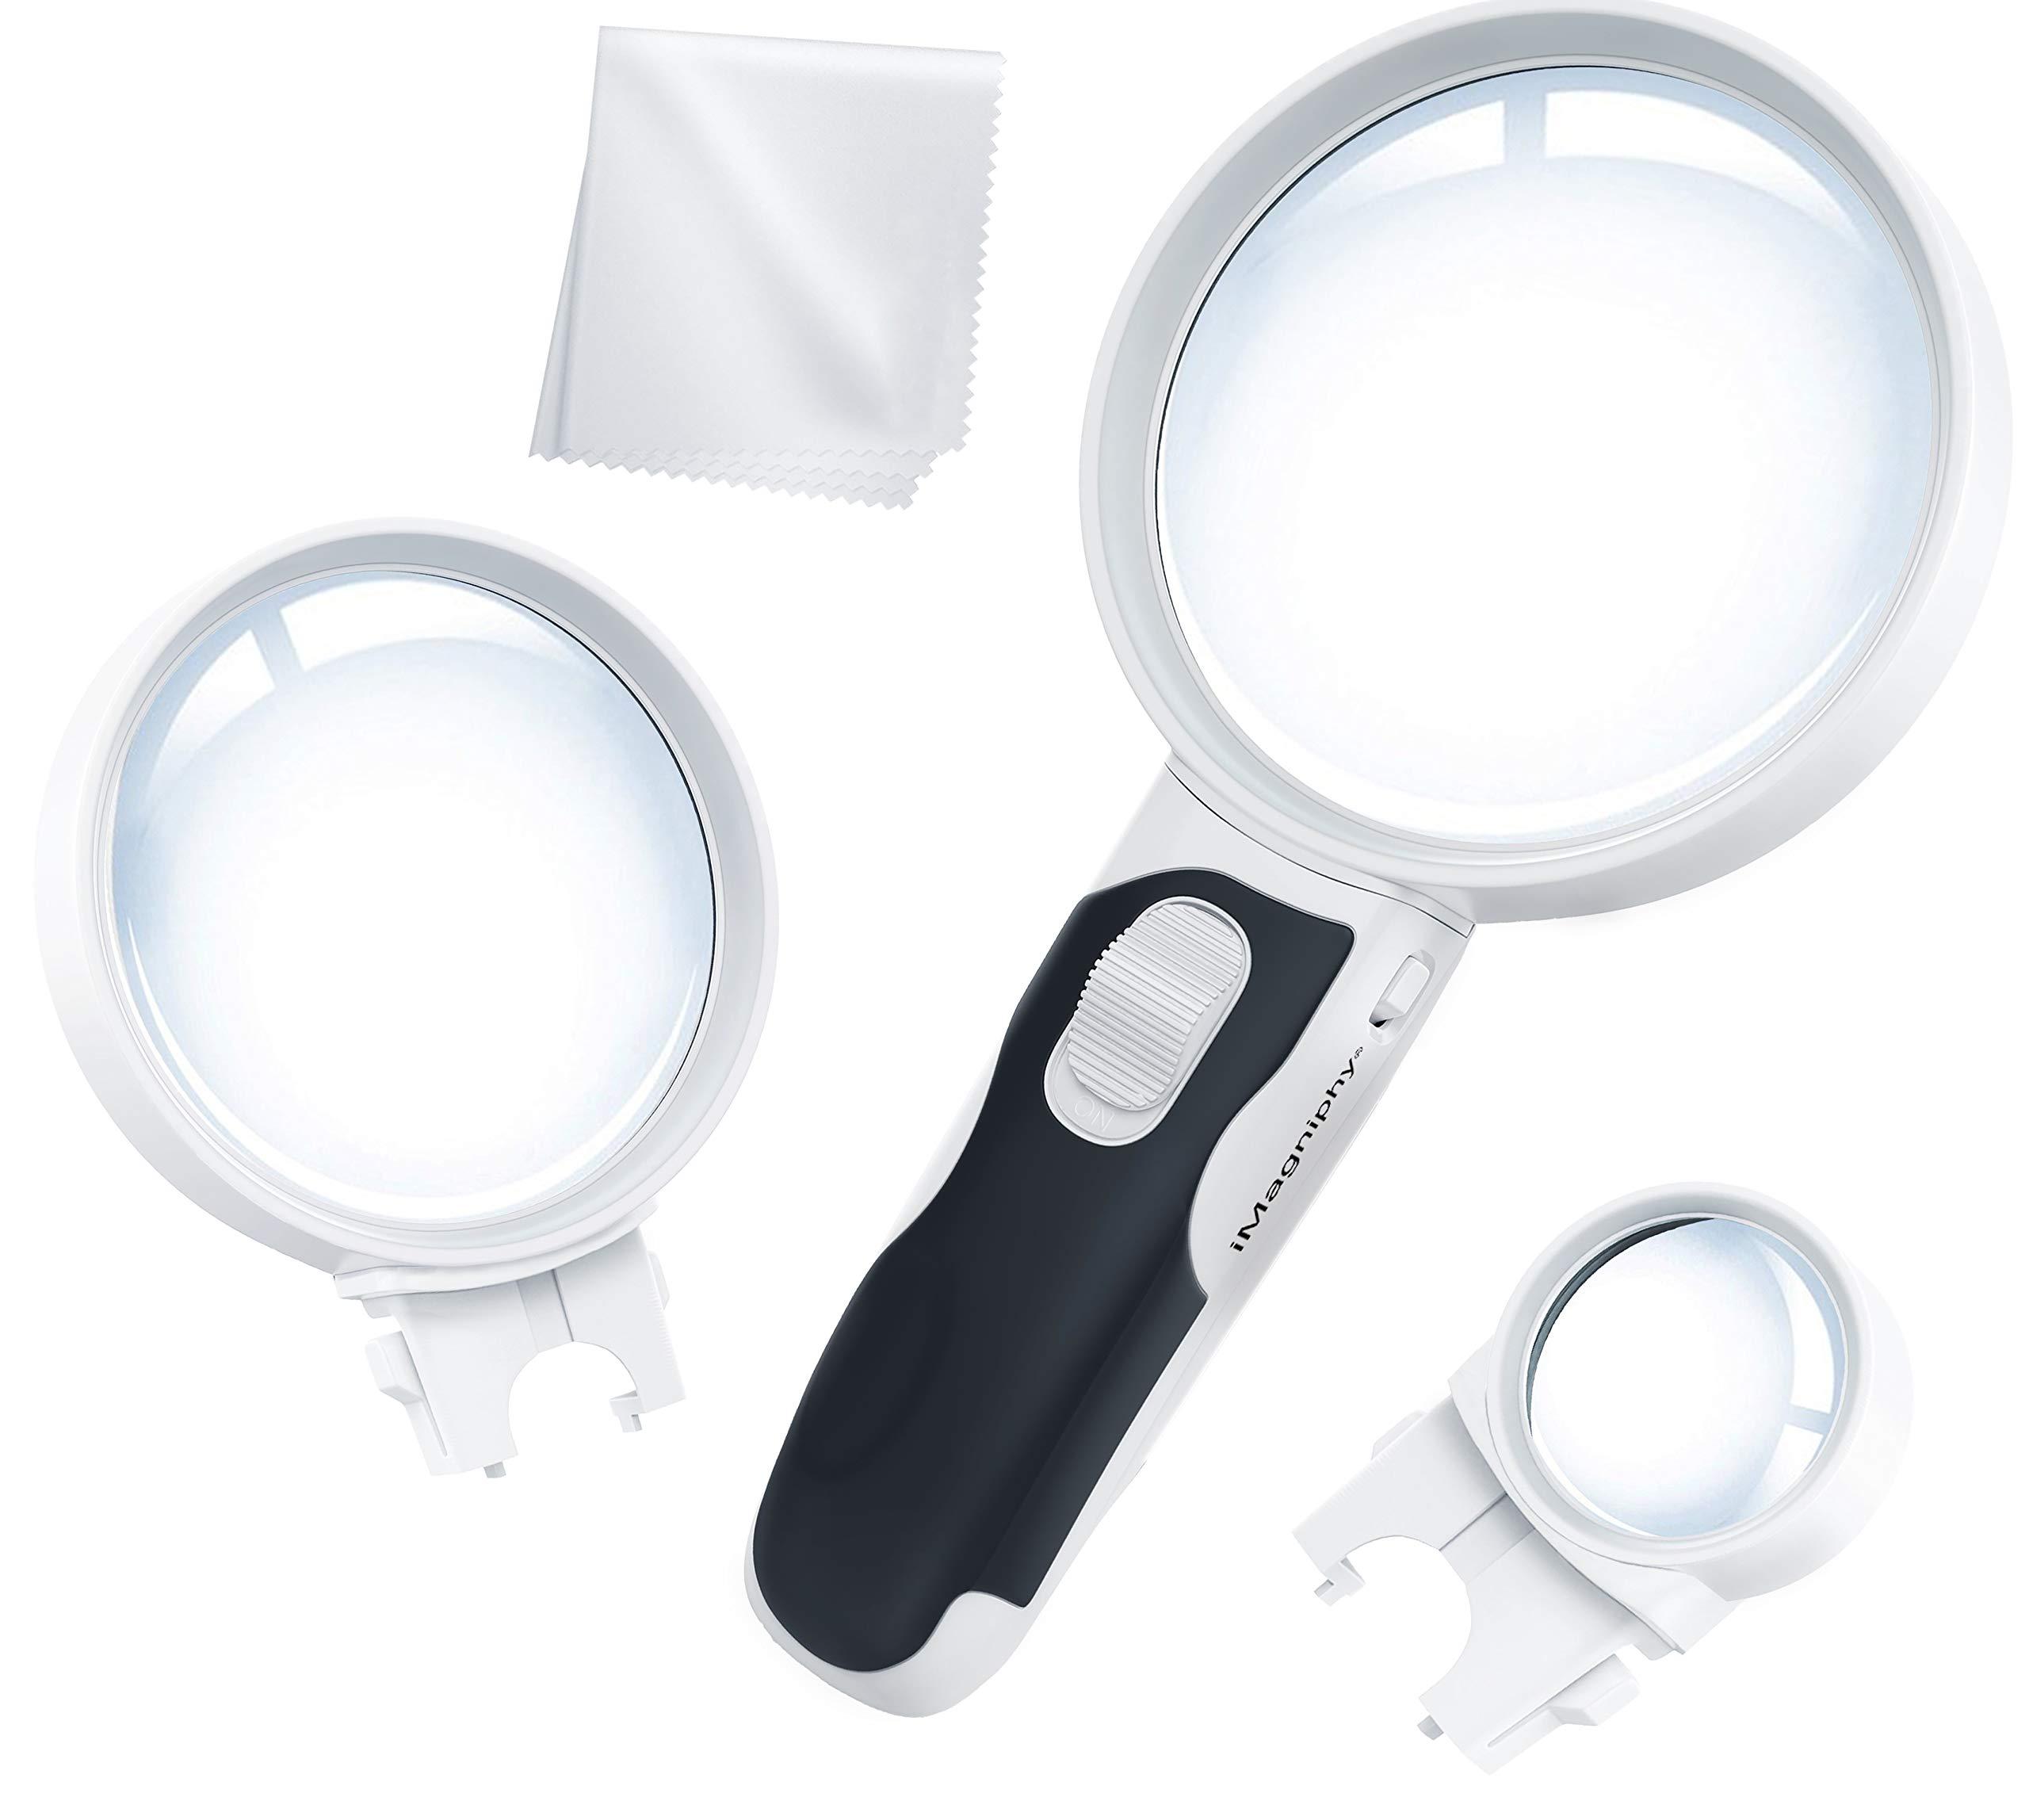 Illuminated Magnifying Magnifier Degeneration Computer